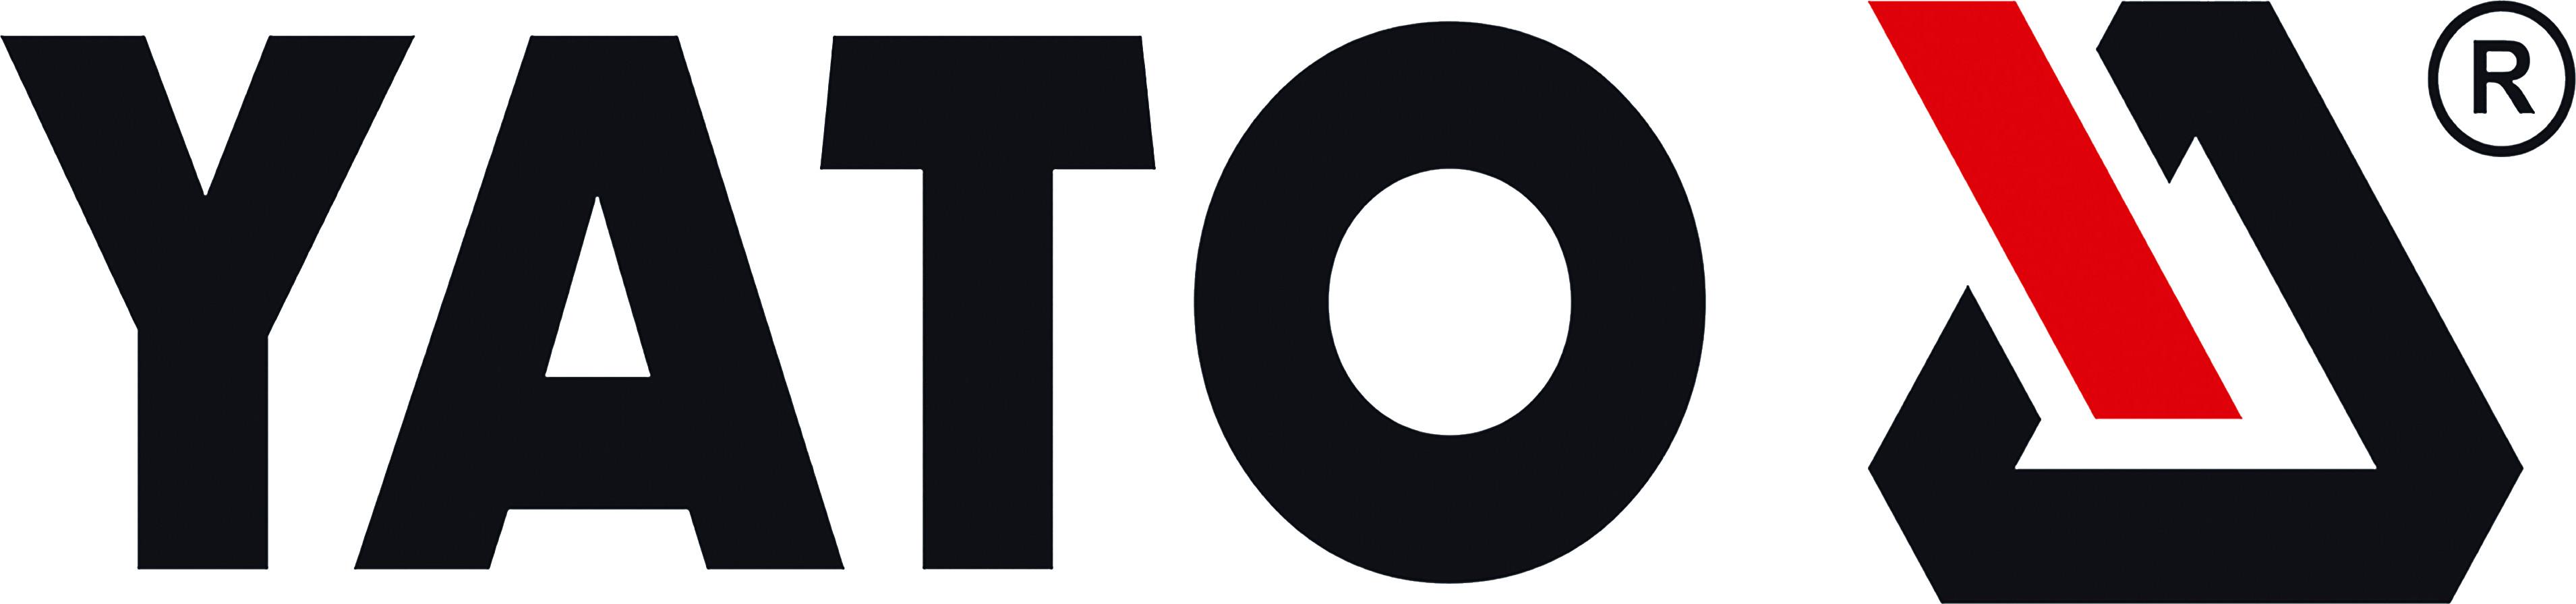 YATO TOOLS(SHANGHAI)CO.,LTD